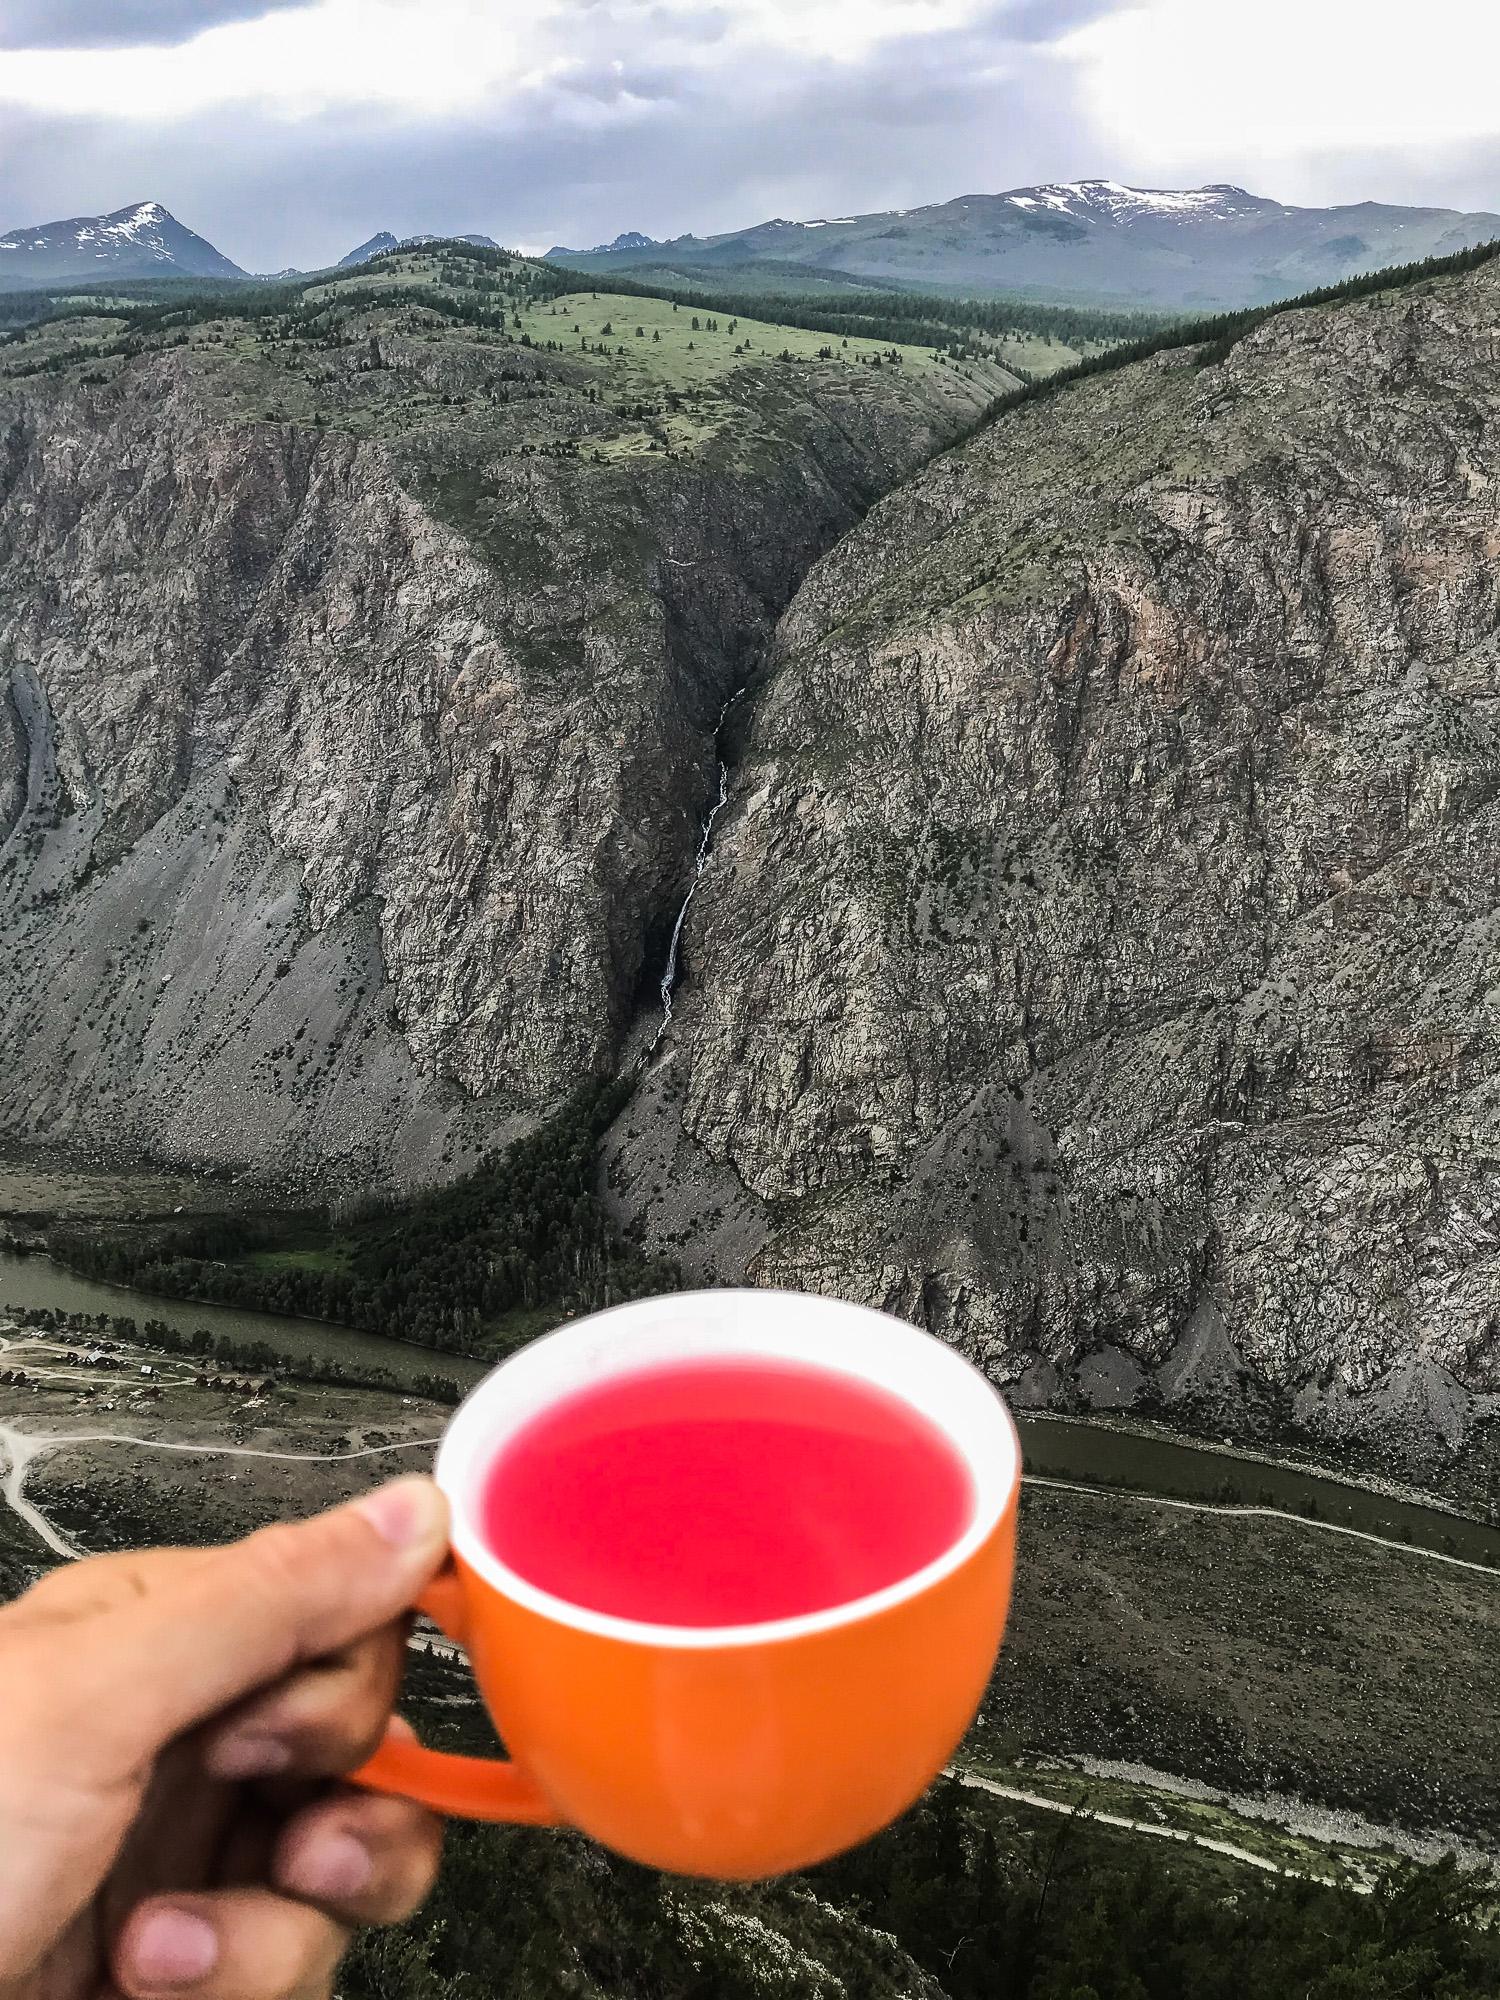 Katy-Yaryk-Altai-Republic-Кату-Ярык-Алтай-3858